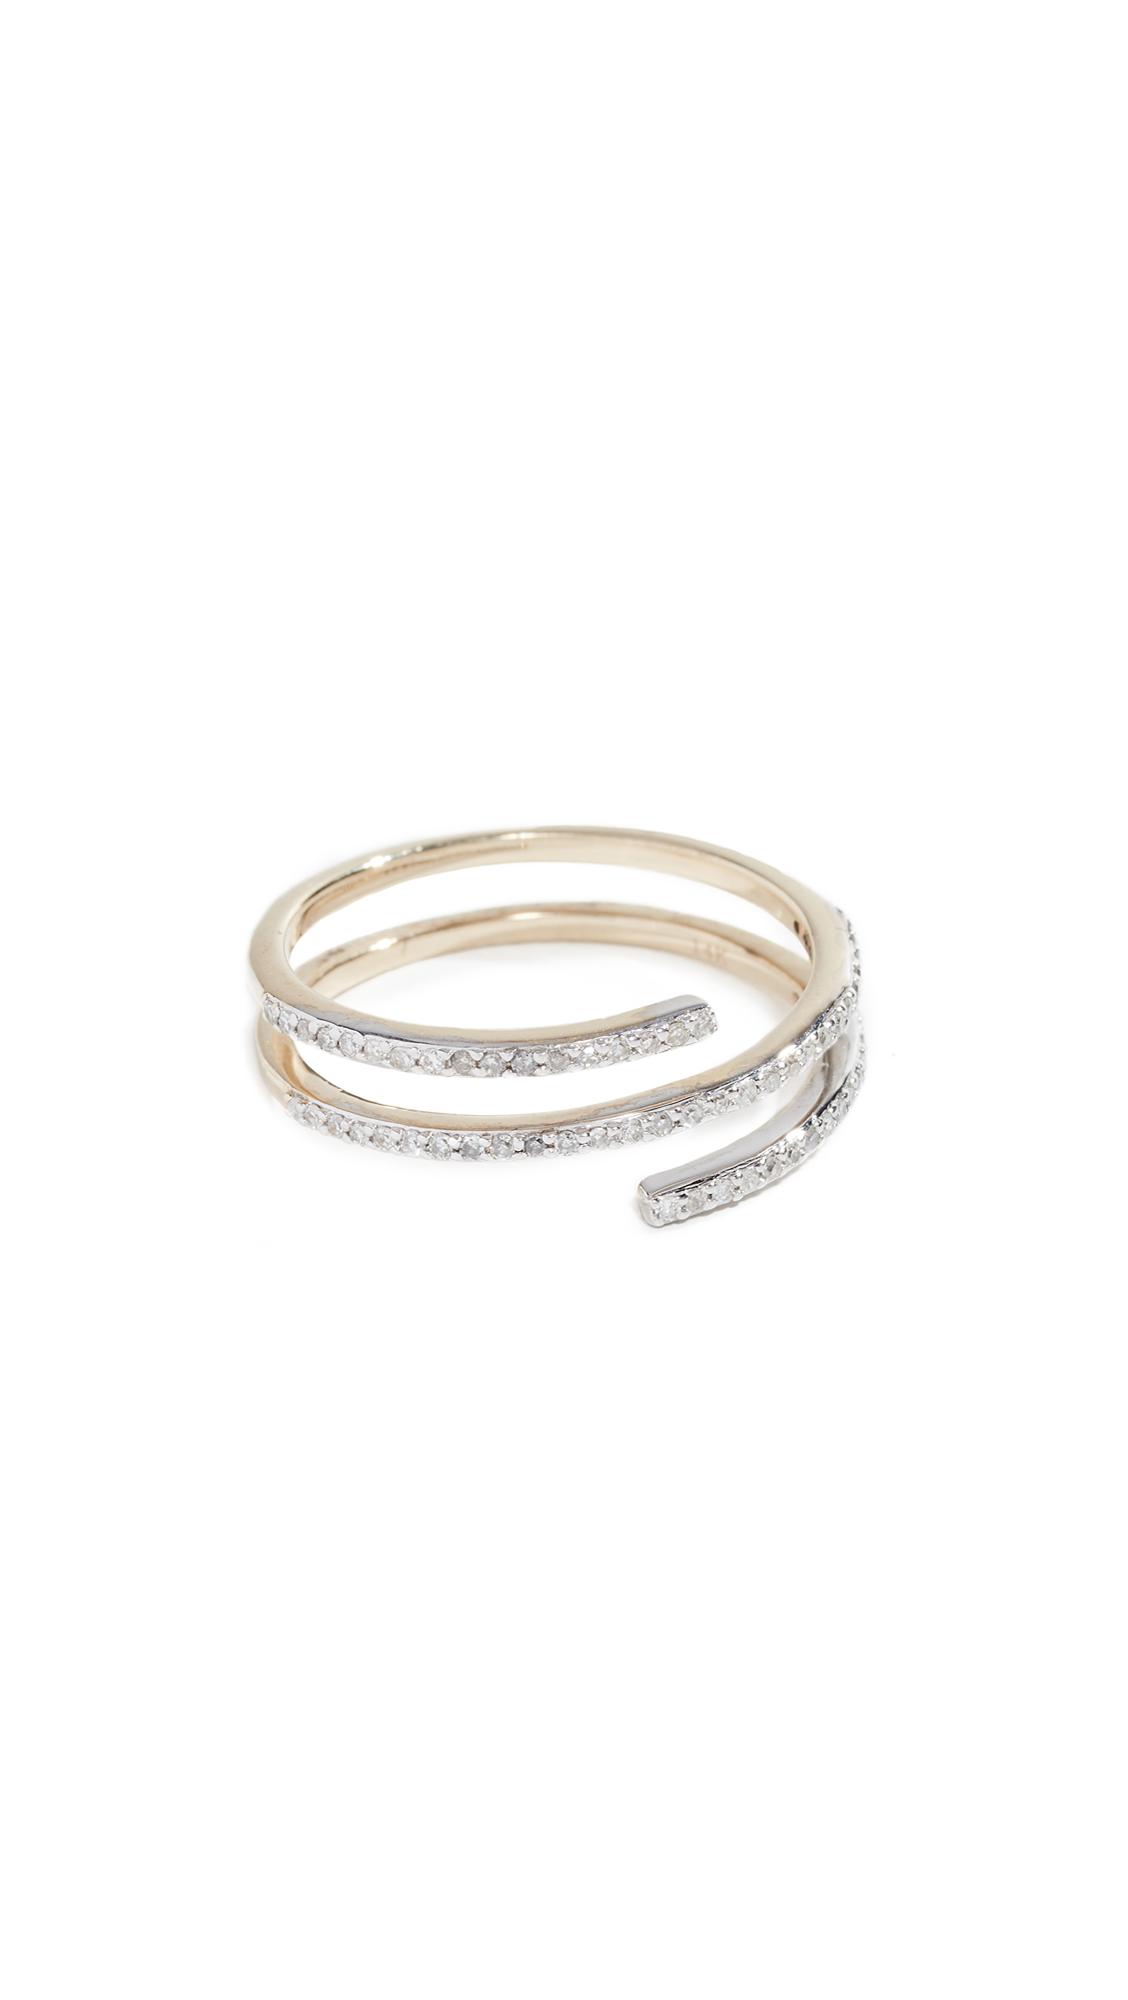 MATEO 14K Diamond Spiral Ring in Yellow Gold